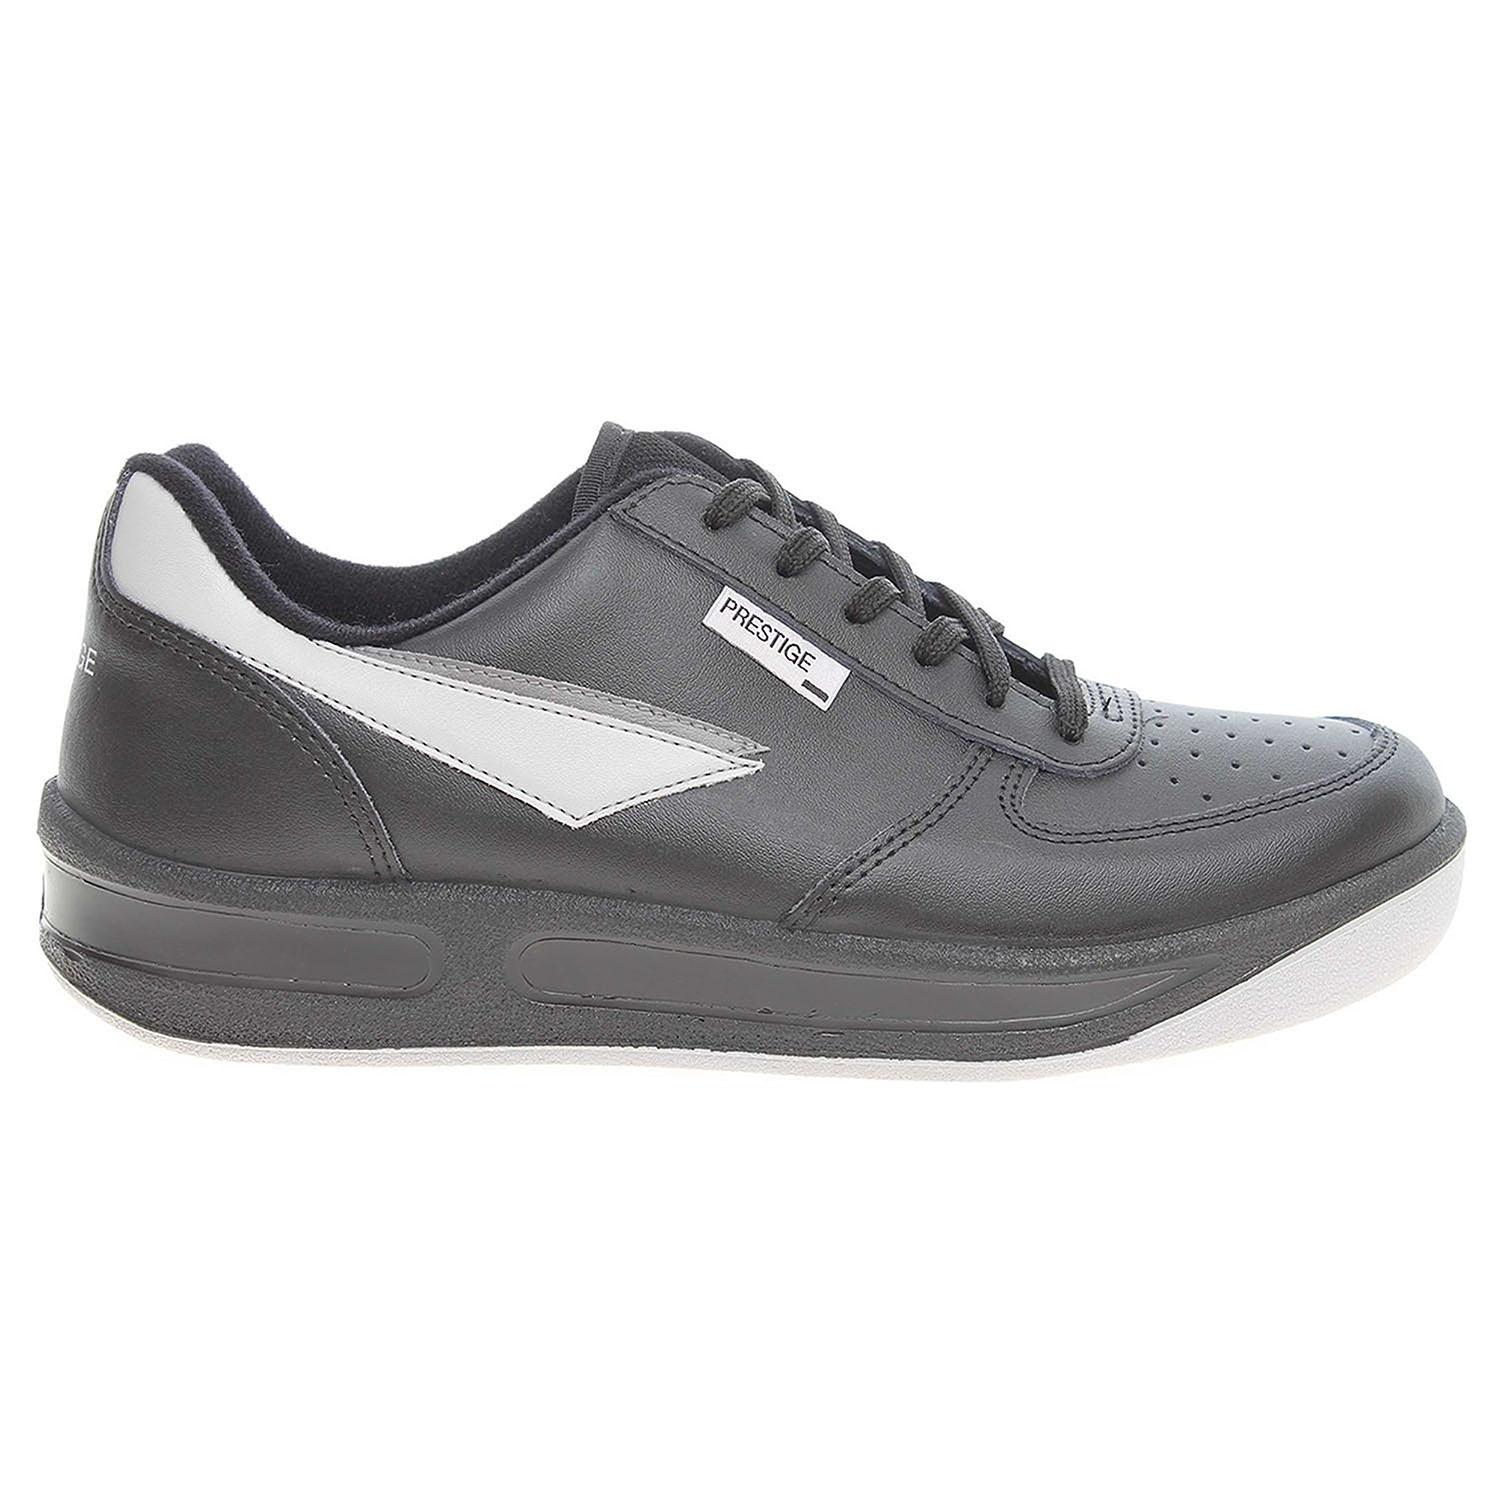 6d0bbe3dcfc Ecco Prestige dámská obuv 86808-60 černá 23900195